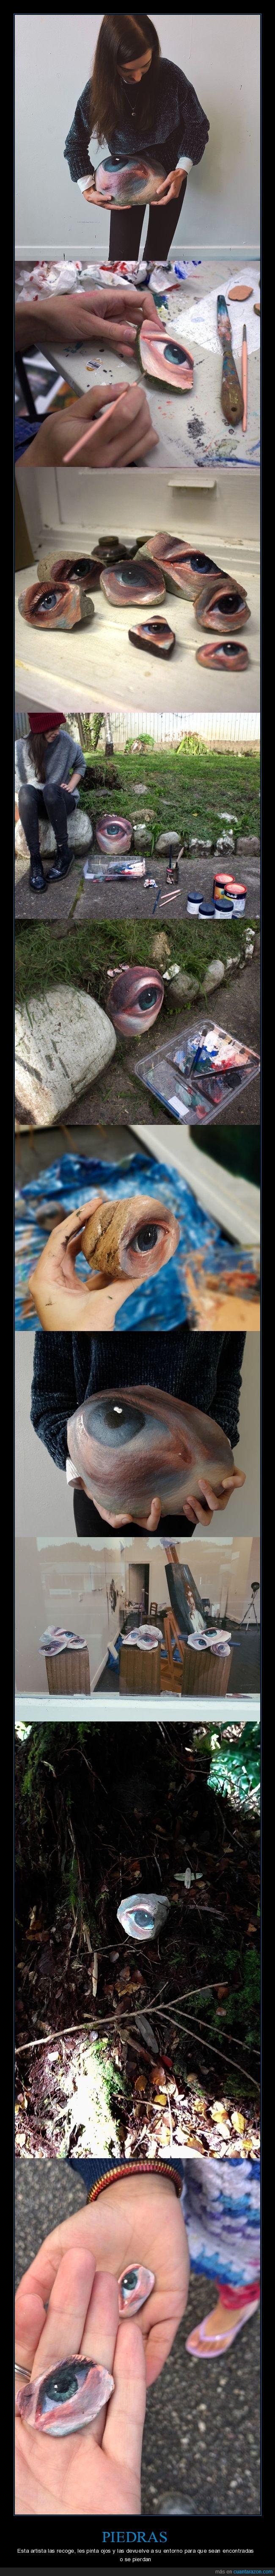 artista,ojos,piedras,pintar